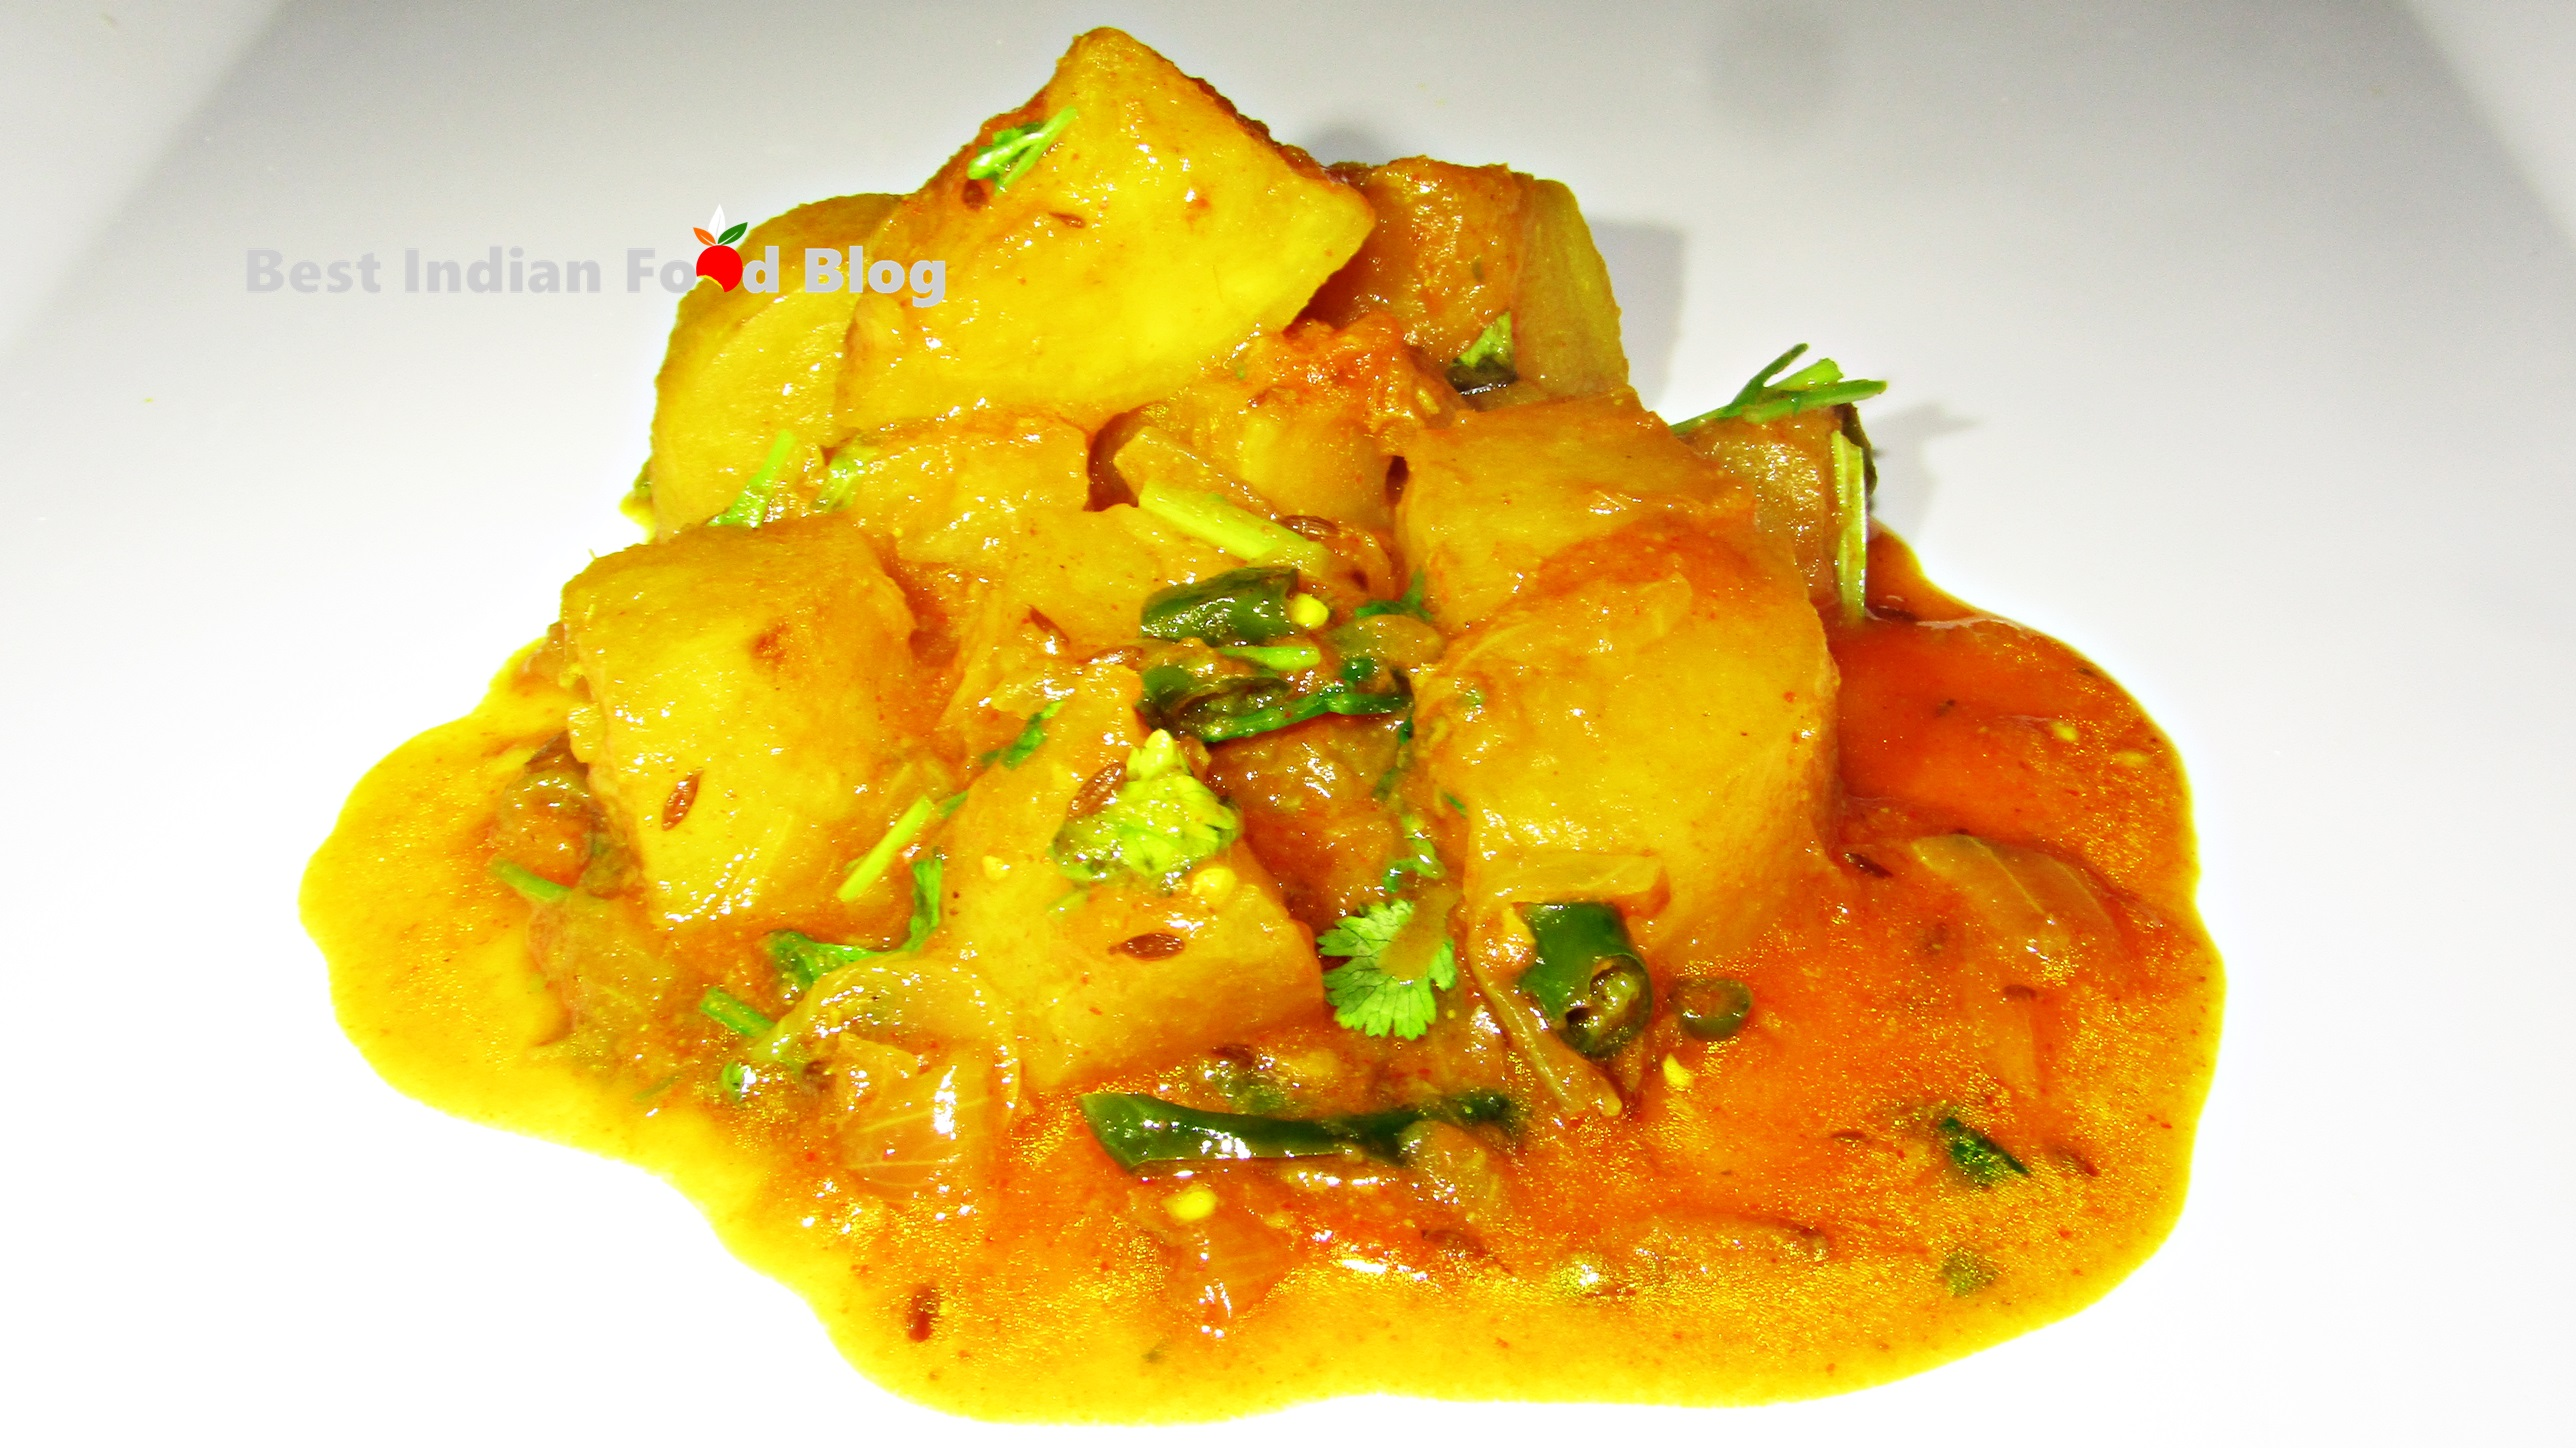 Jara ko Sabzi from Sikkim, India   Best Indian Food Blog   Chayote Root recipe